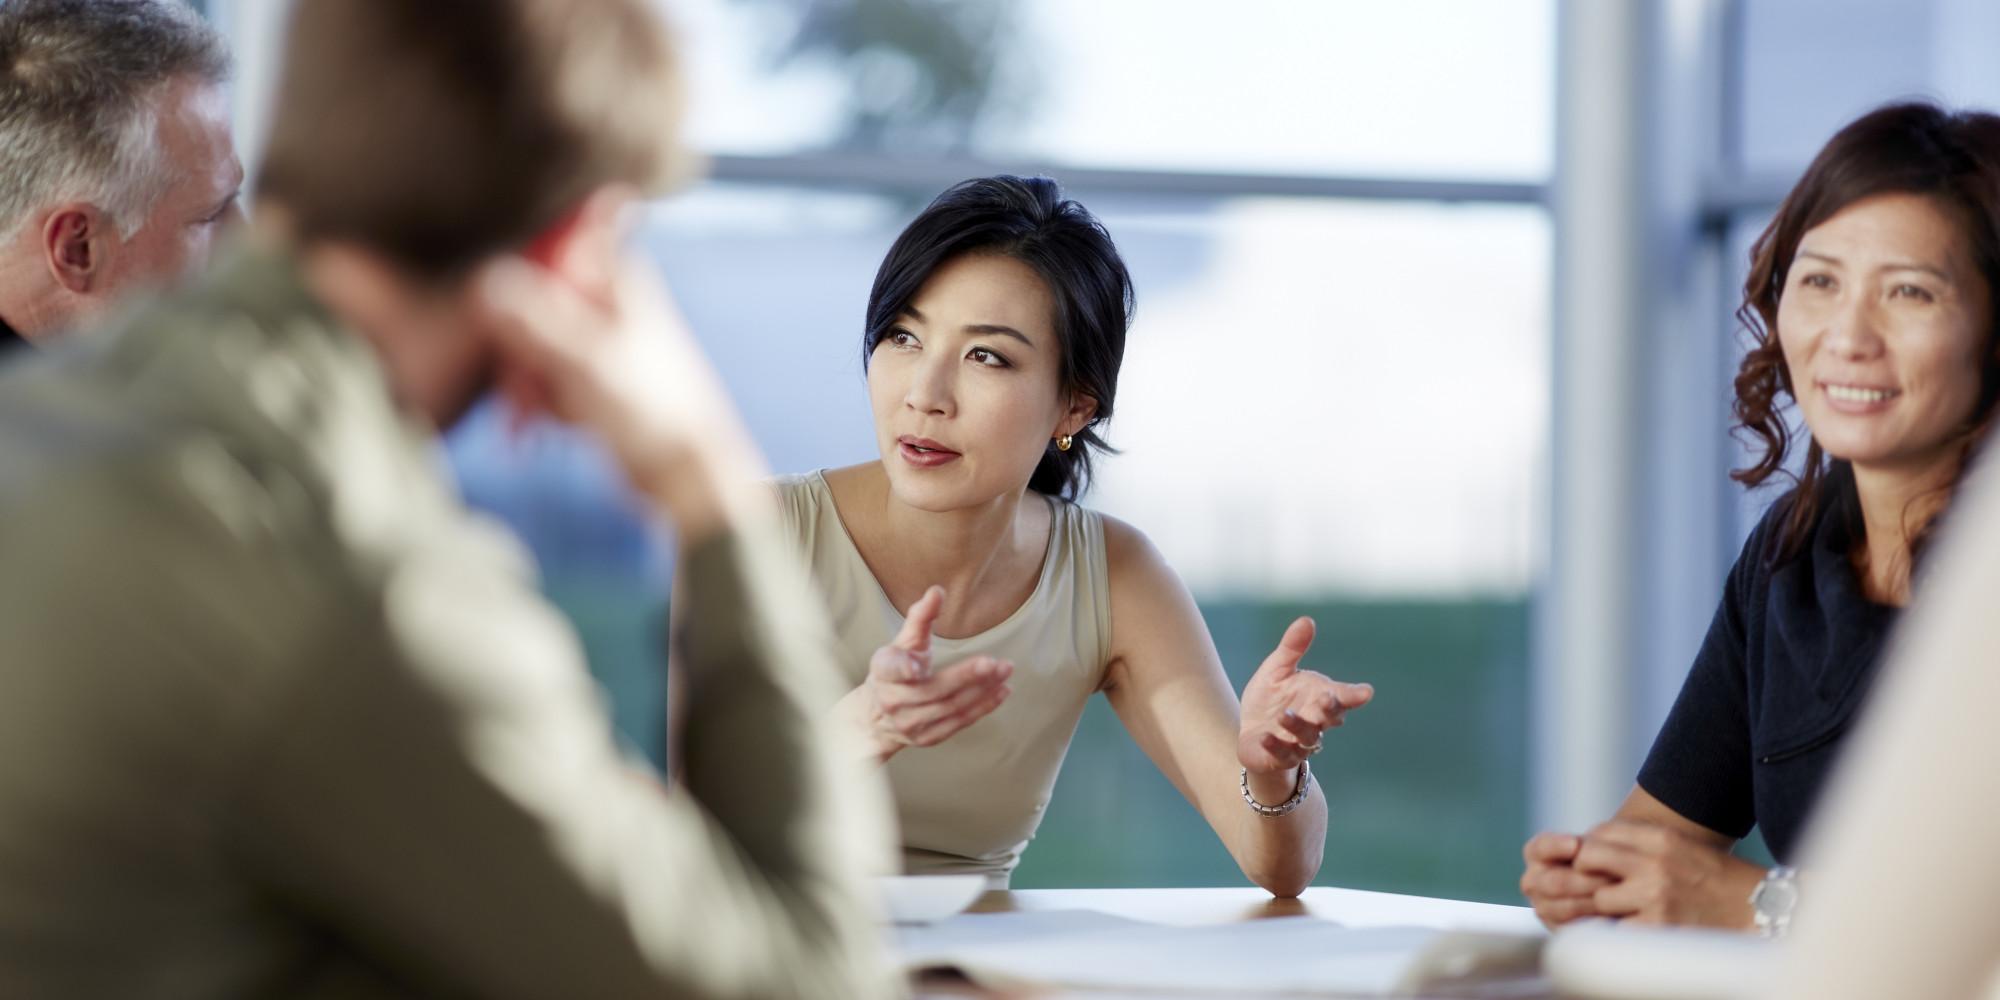 English Speaking Asian Women Around 61